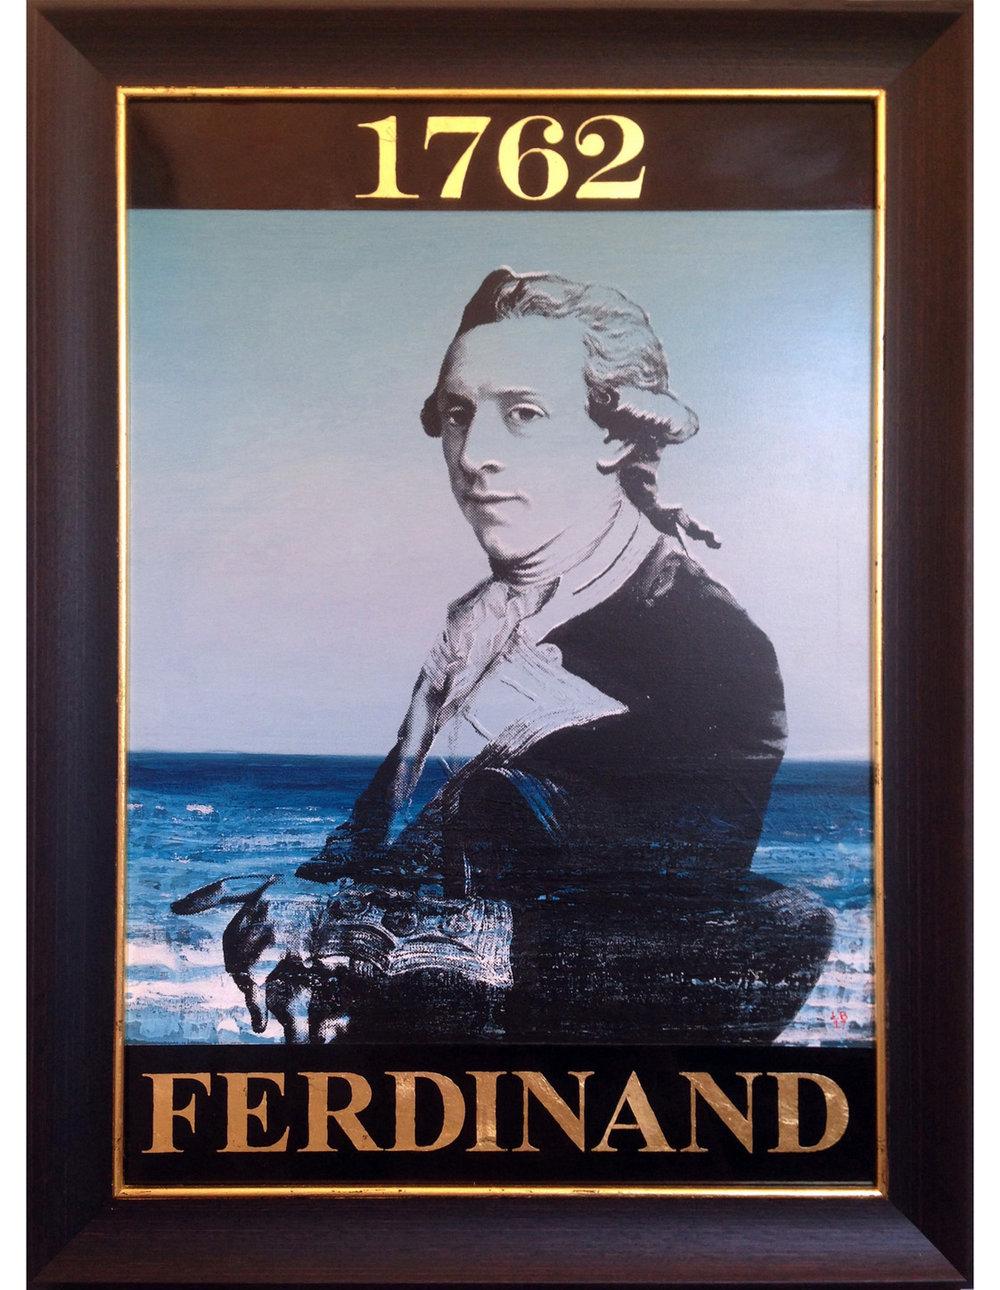 w Ferdinand 1762.jpg